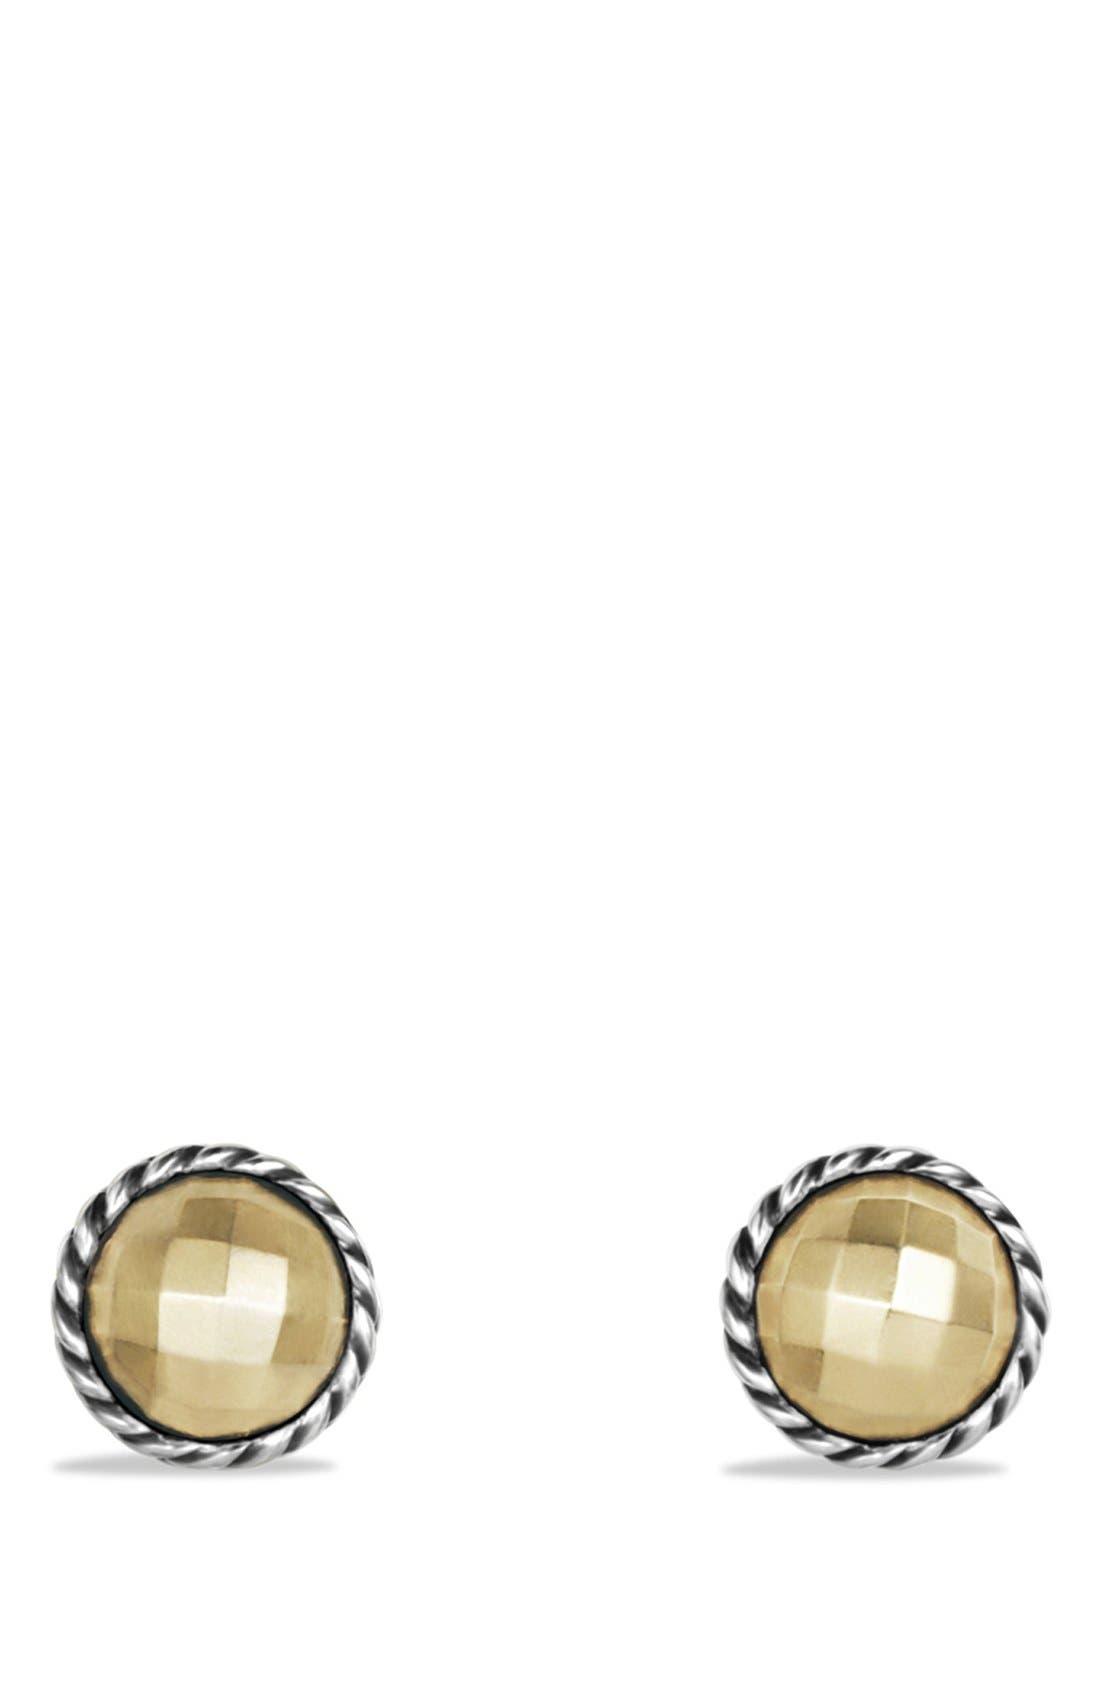 DAVID YURMAN 'Châtelaine' Earrings with Gold